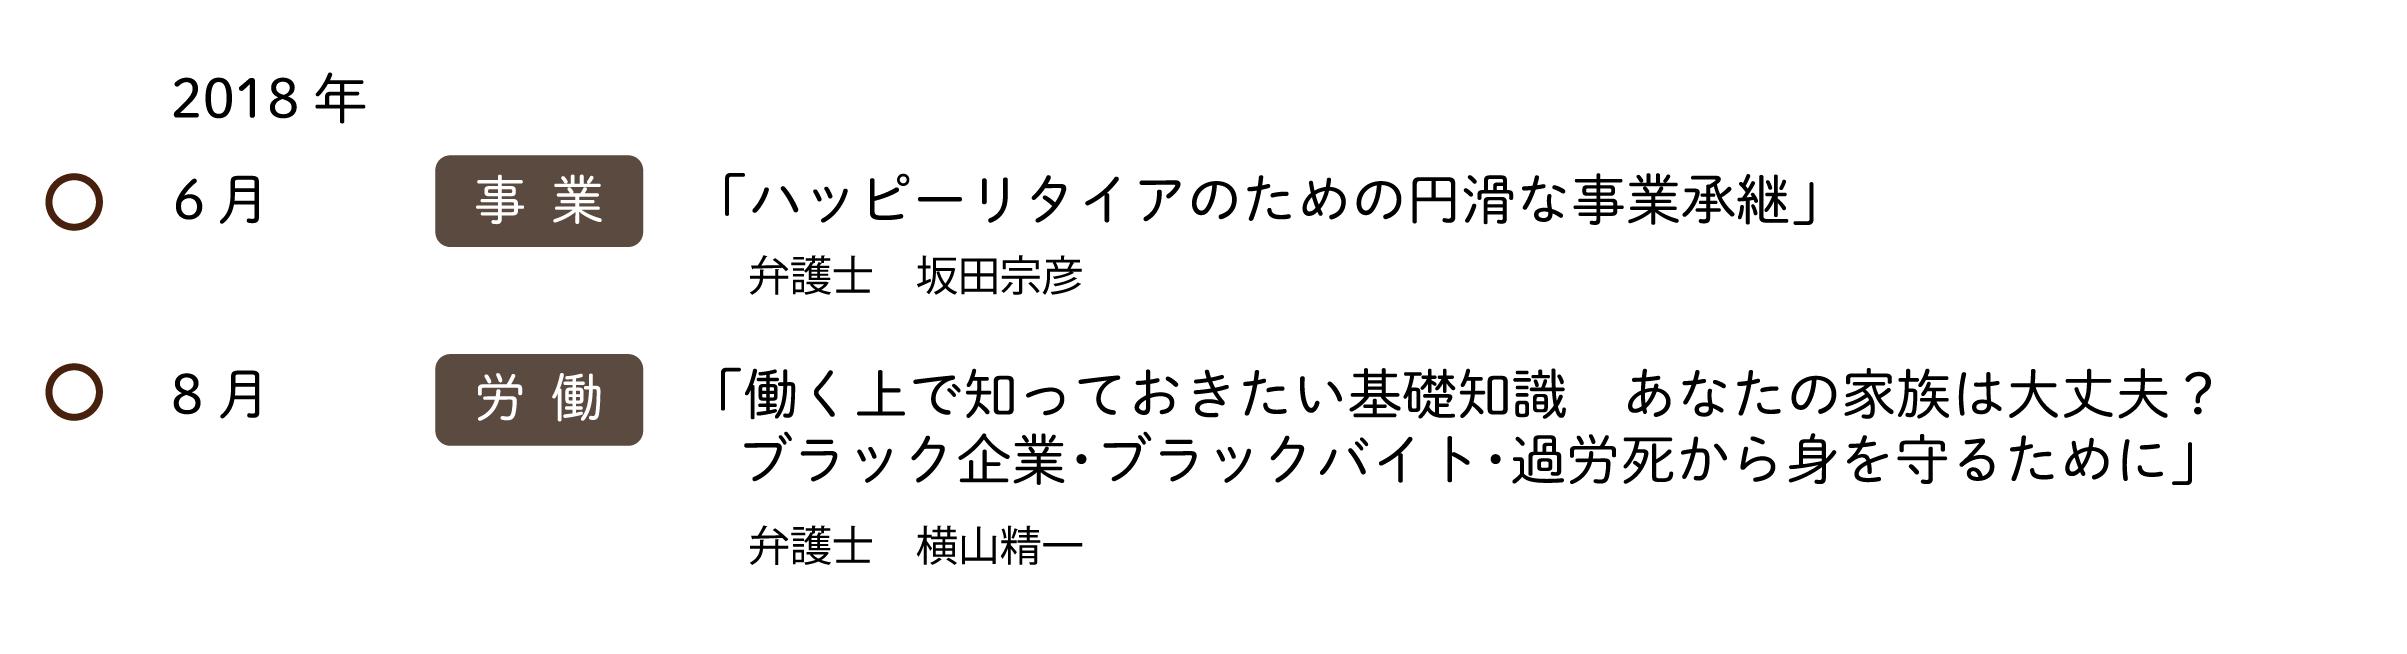 2018_6